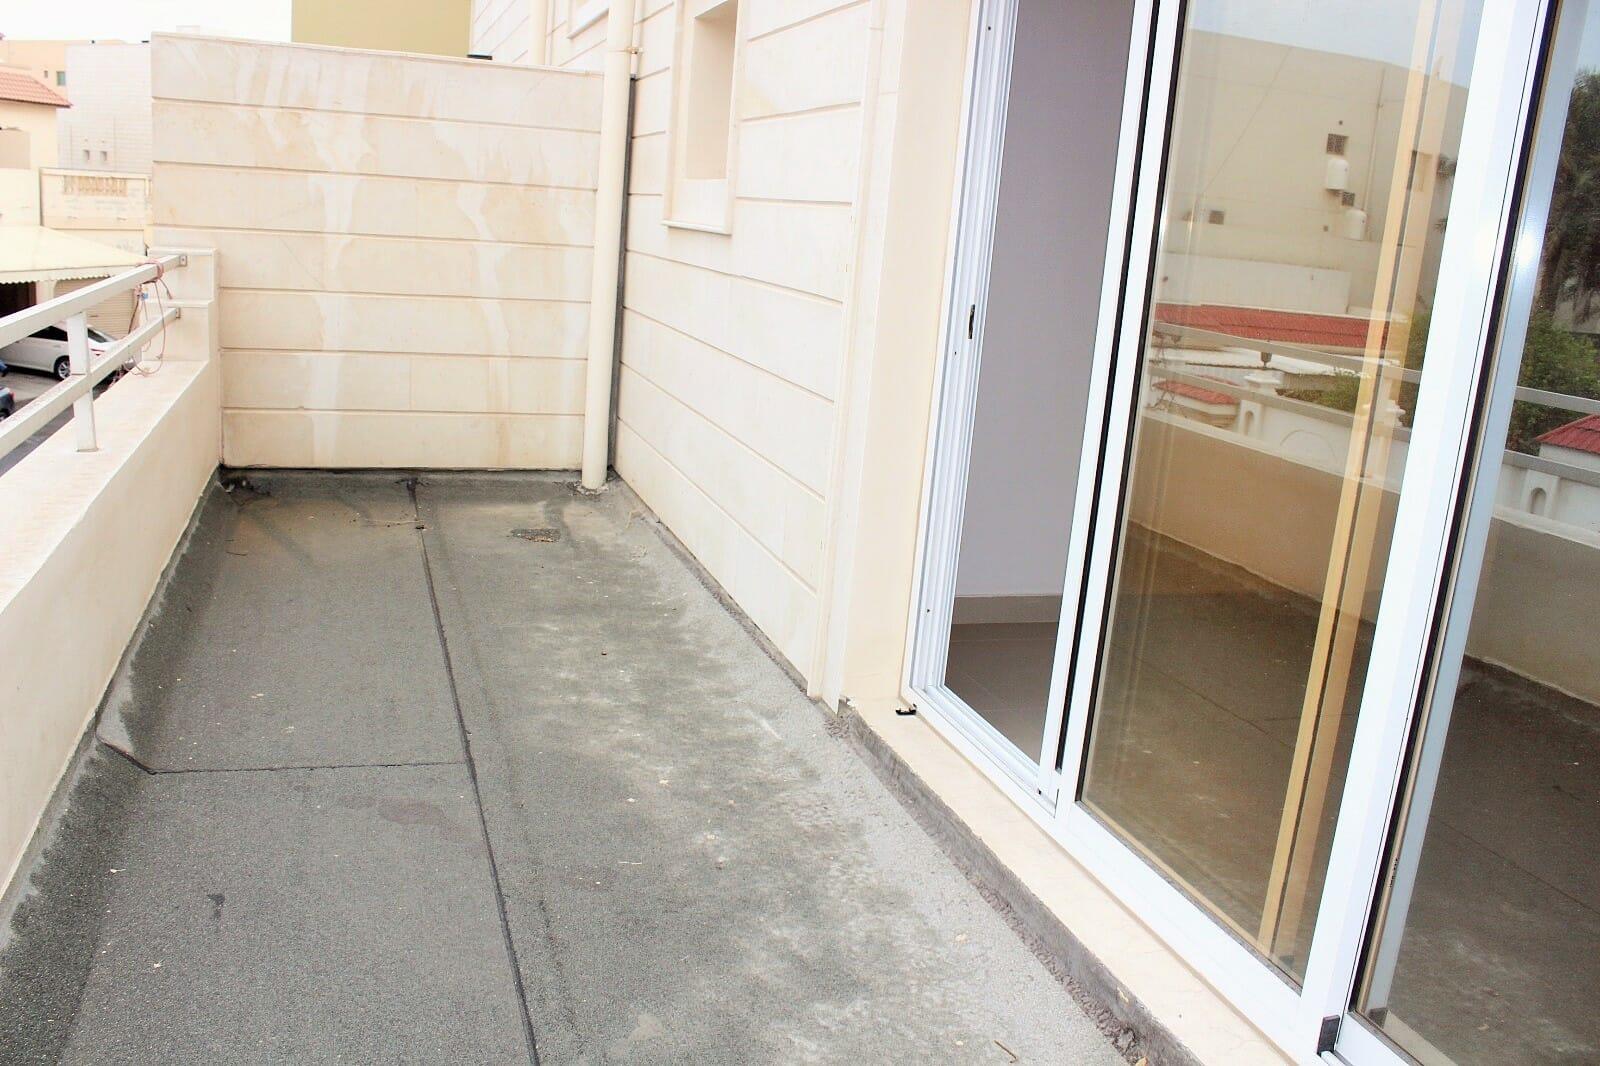 Three Bedroom Unfurnished Apartment6